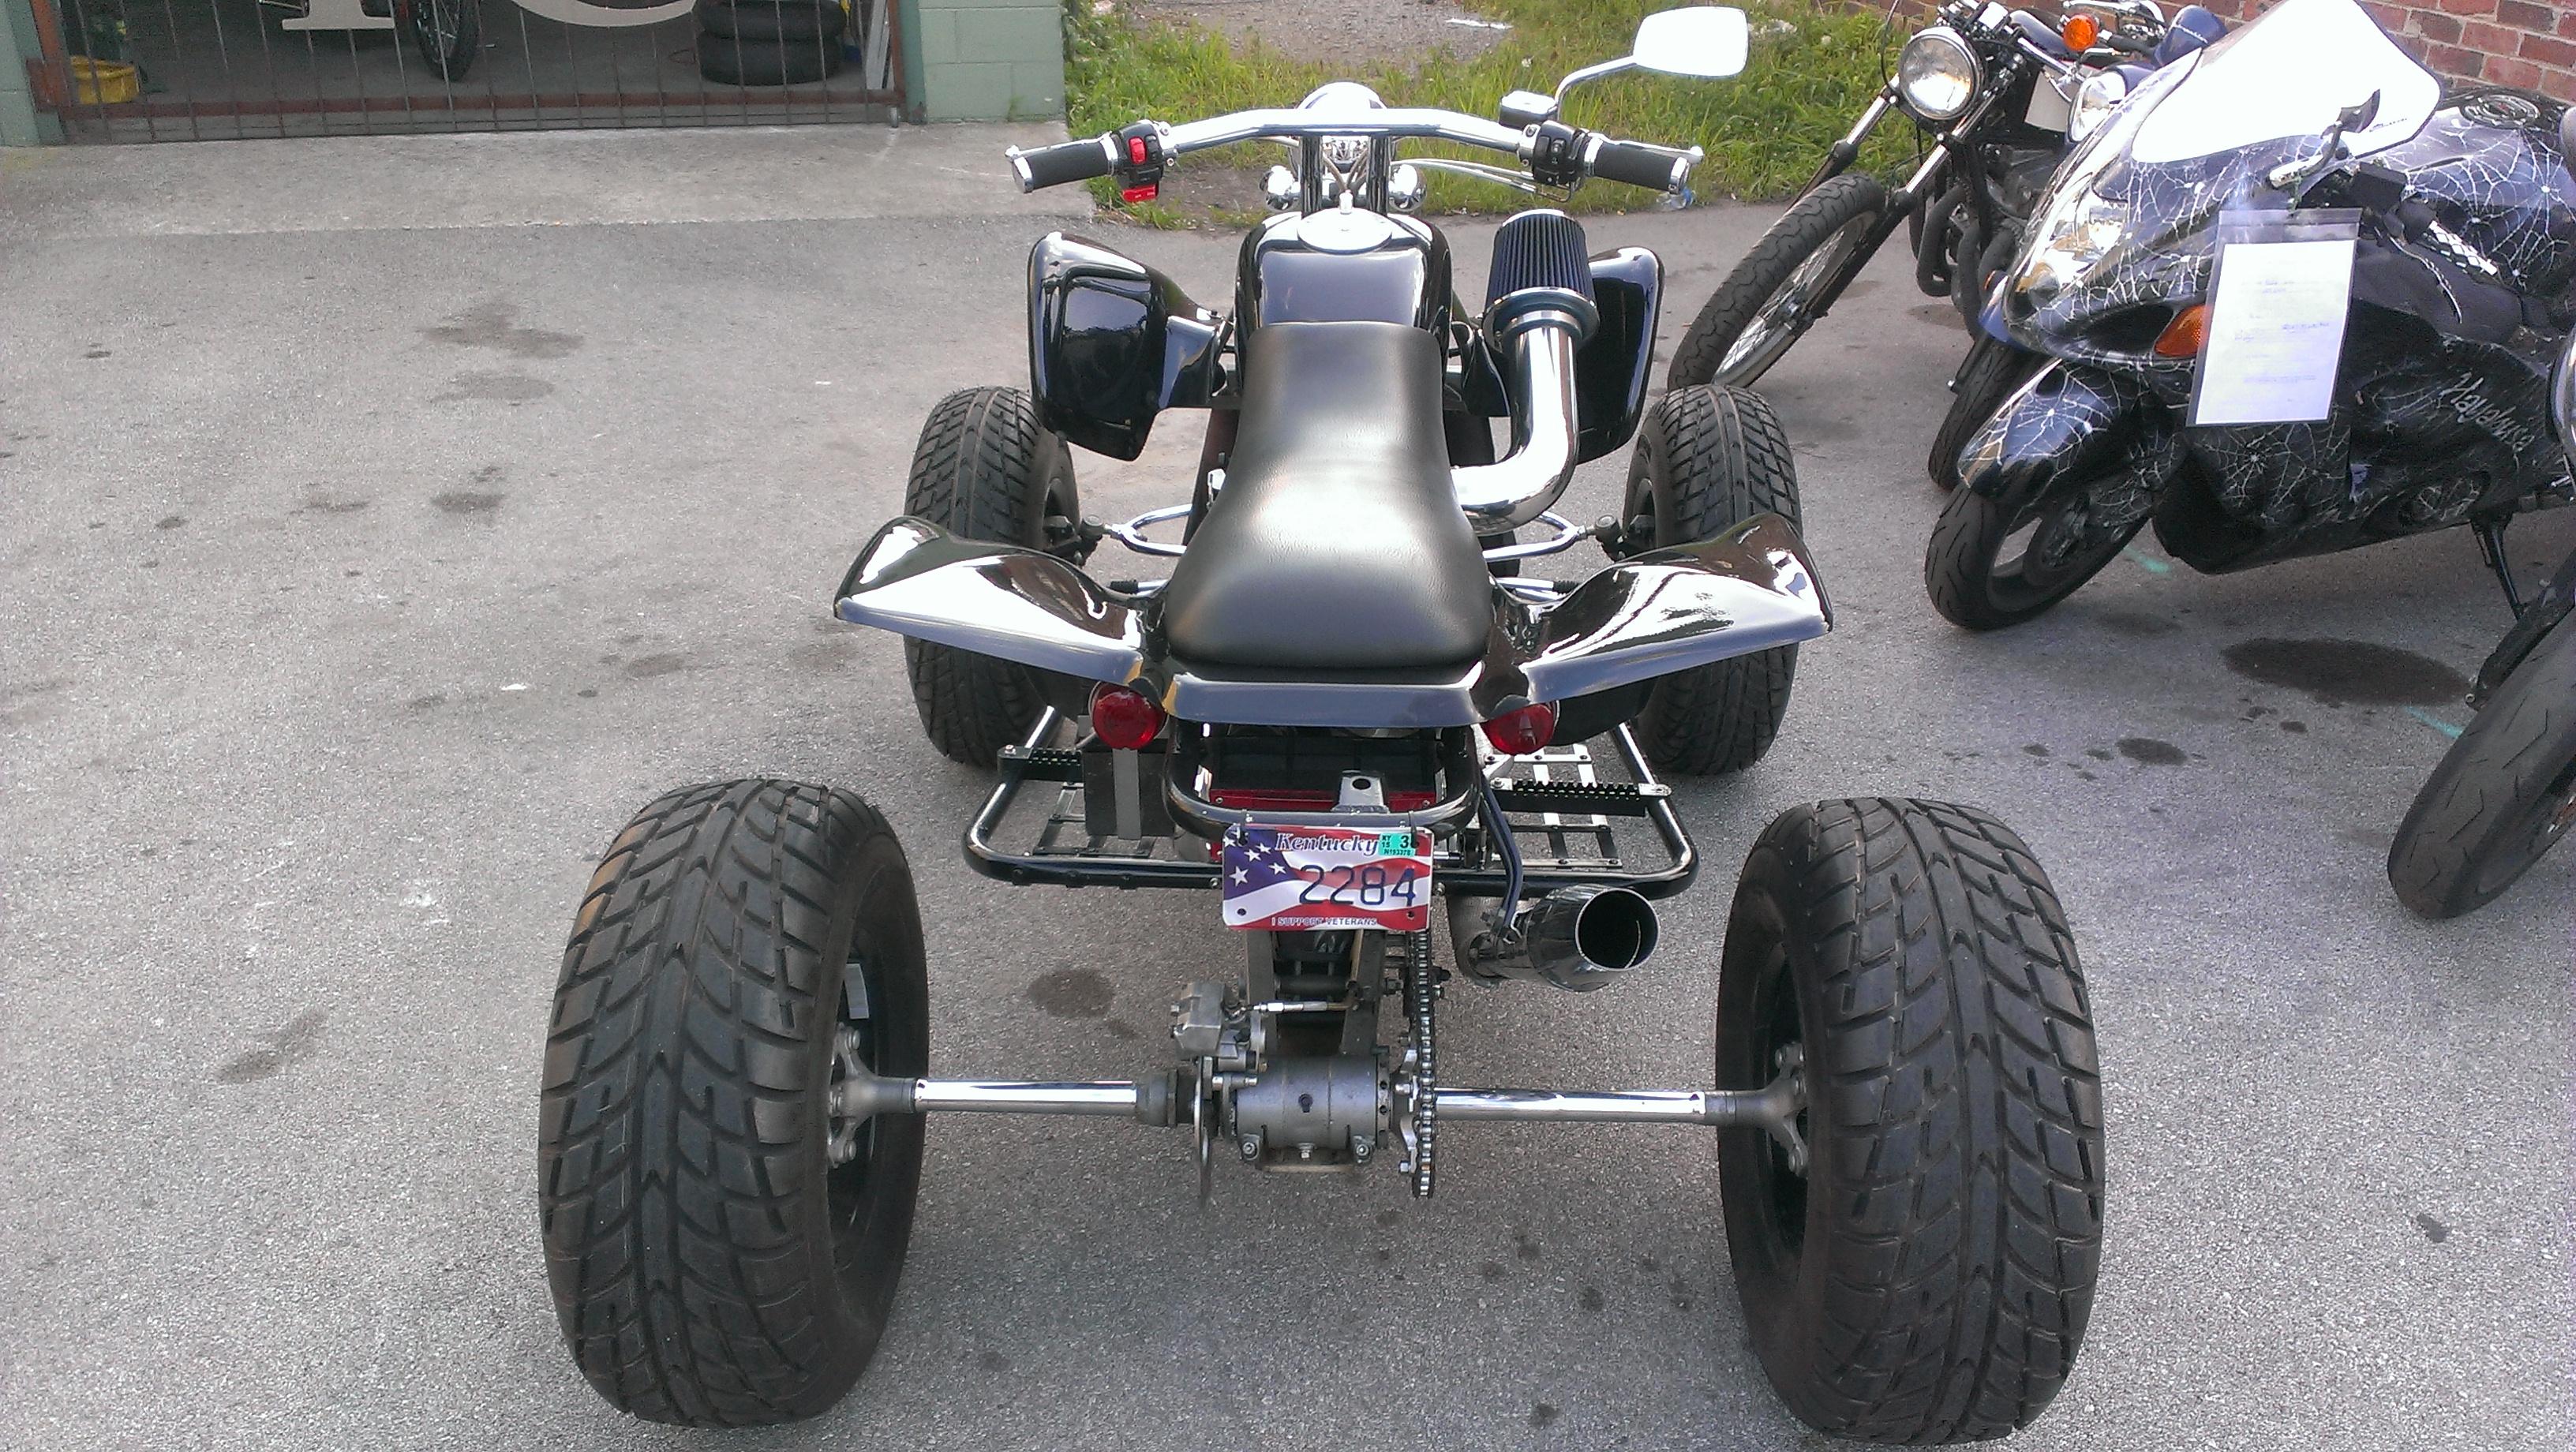 Harley Davidson Lexington Ky >> HARLEY DAVIDSON ATV - 4 WHEELER - ATV For Sale? Post it ...